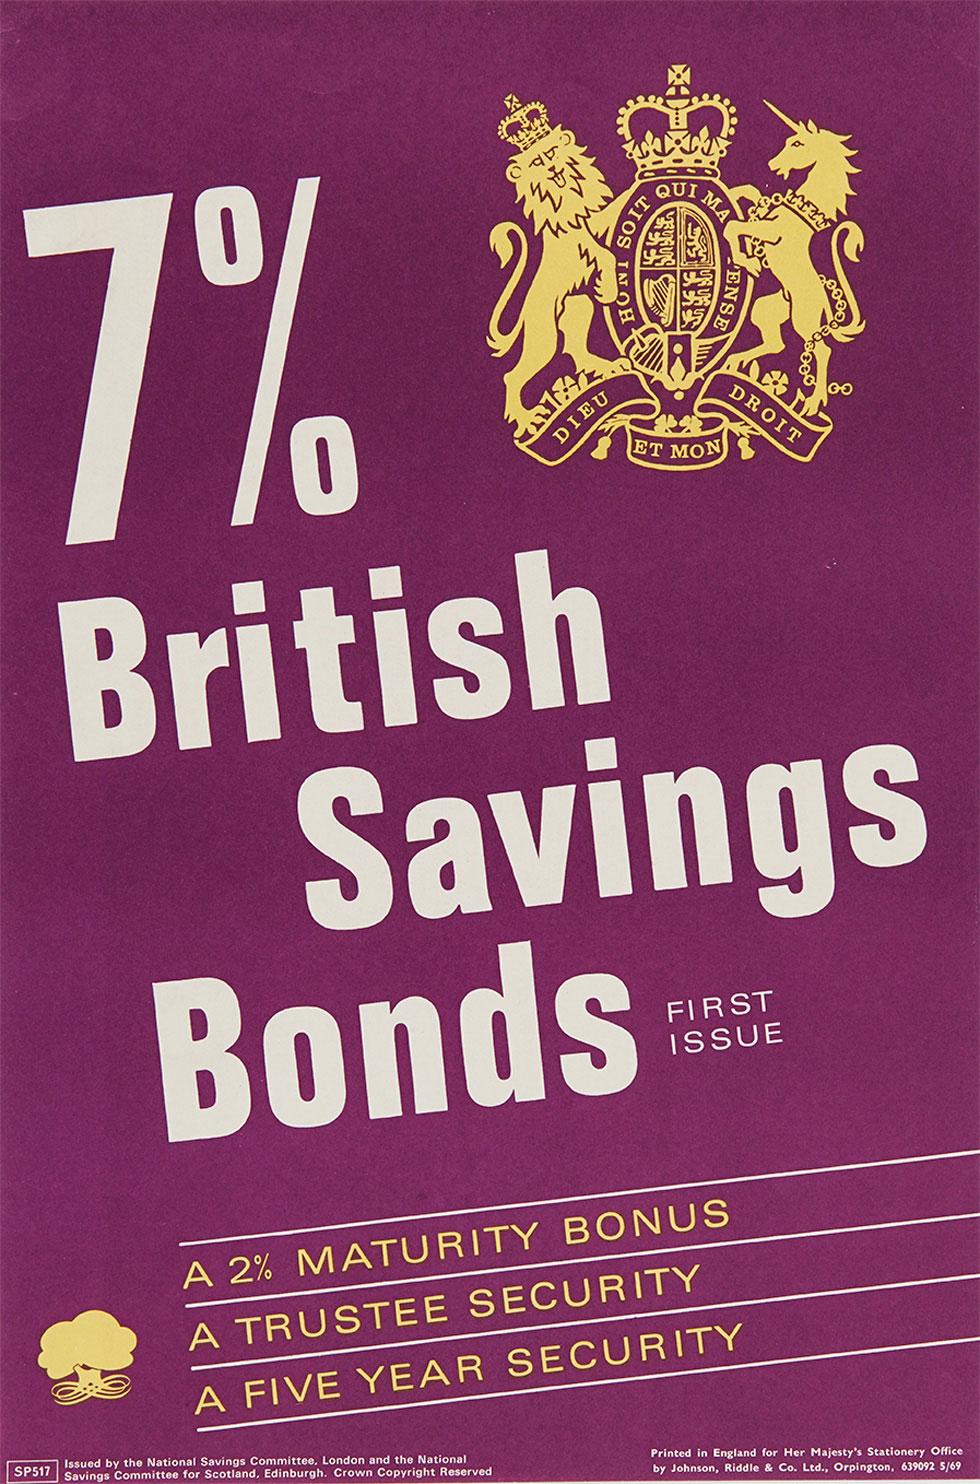 ns&i+over+60+savings+bonds